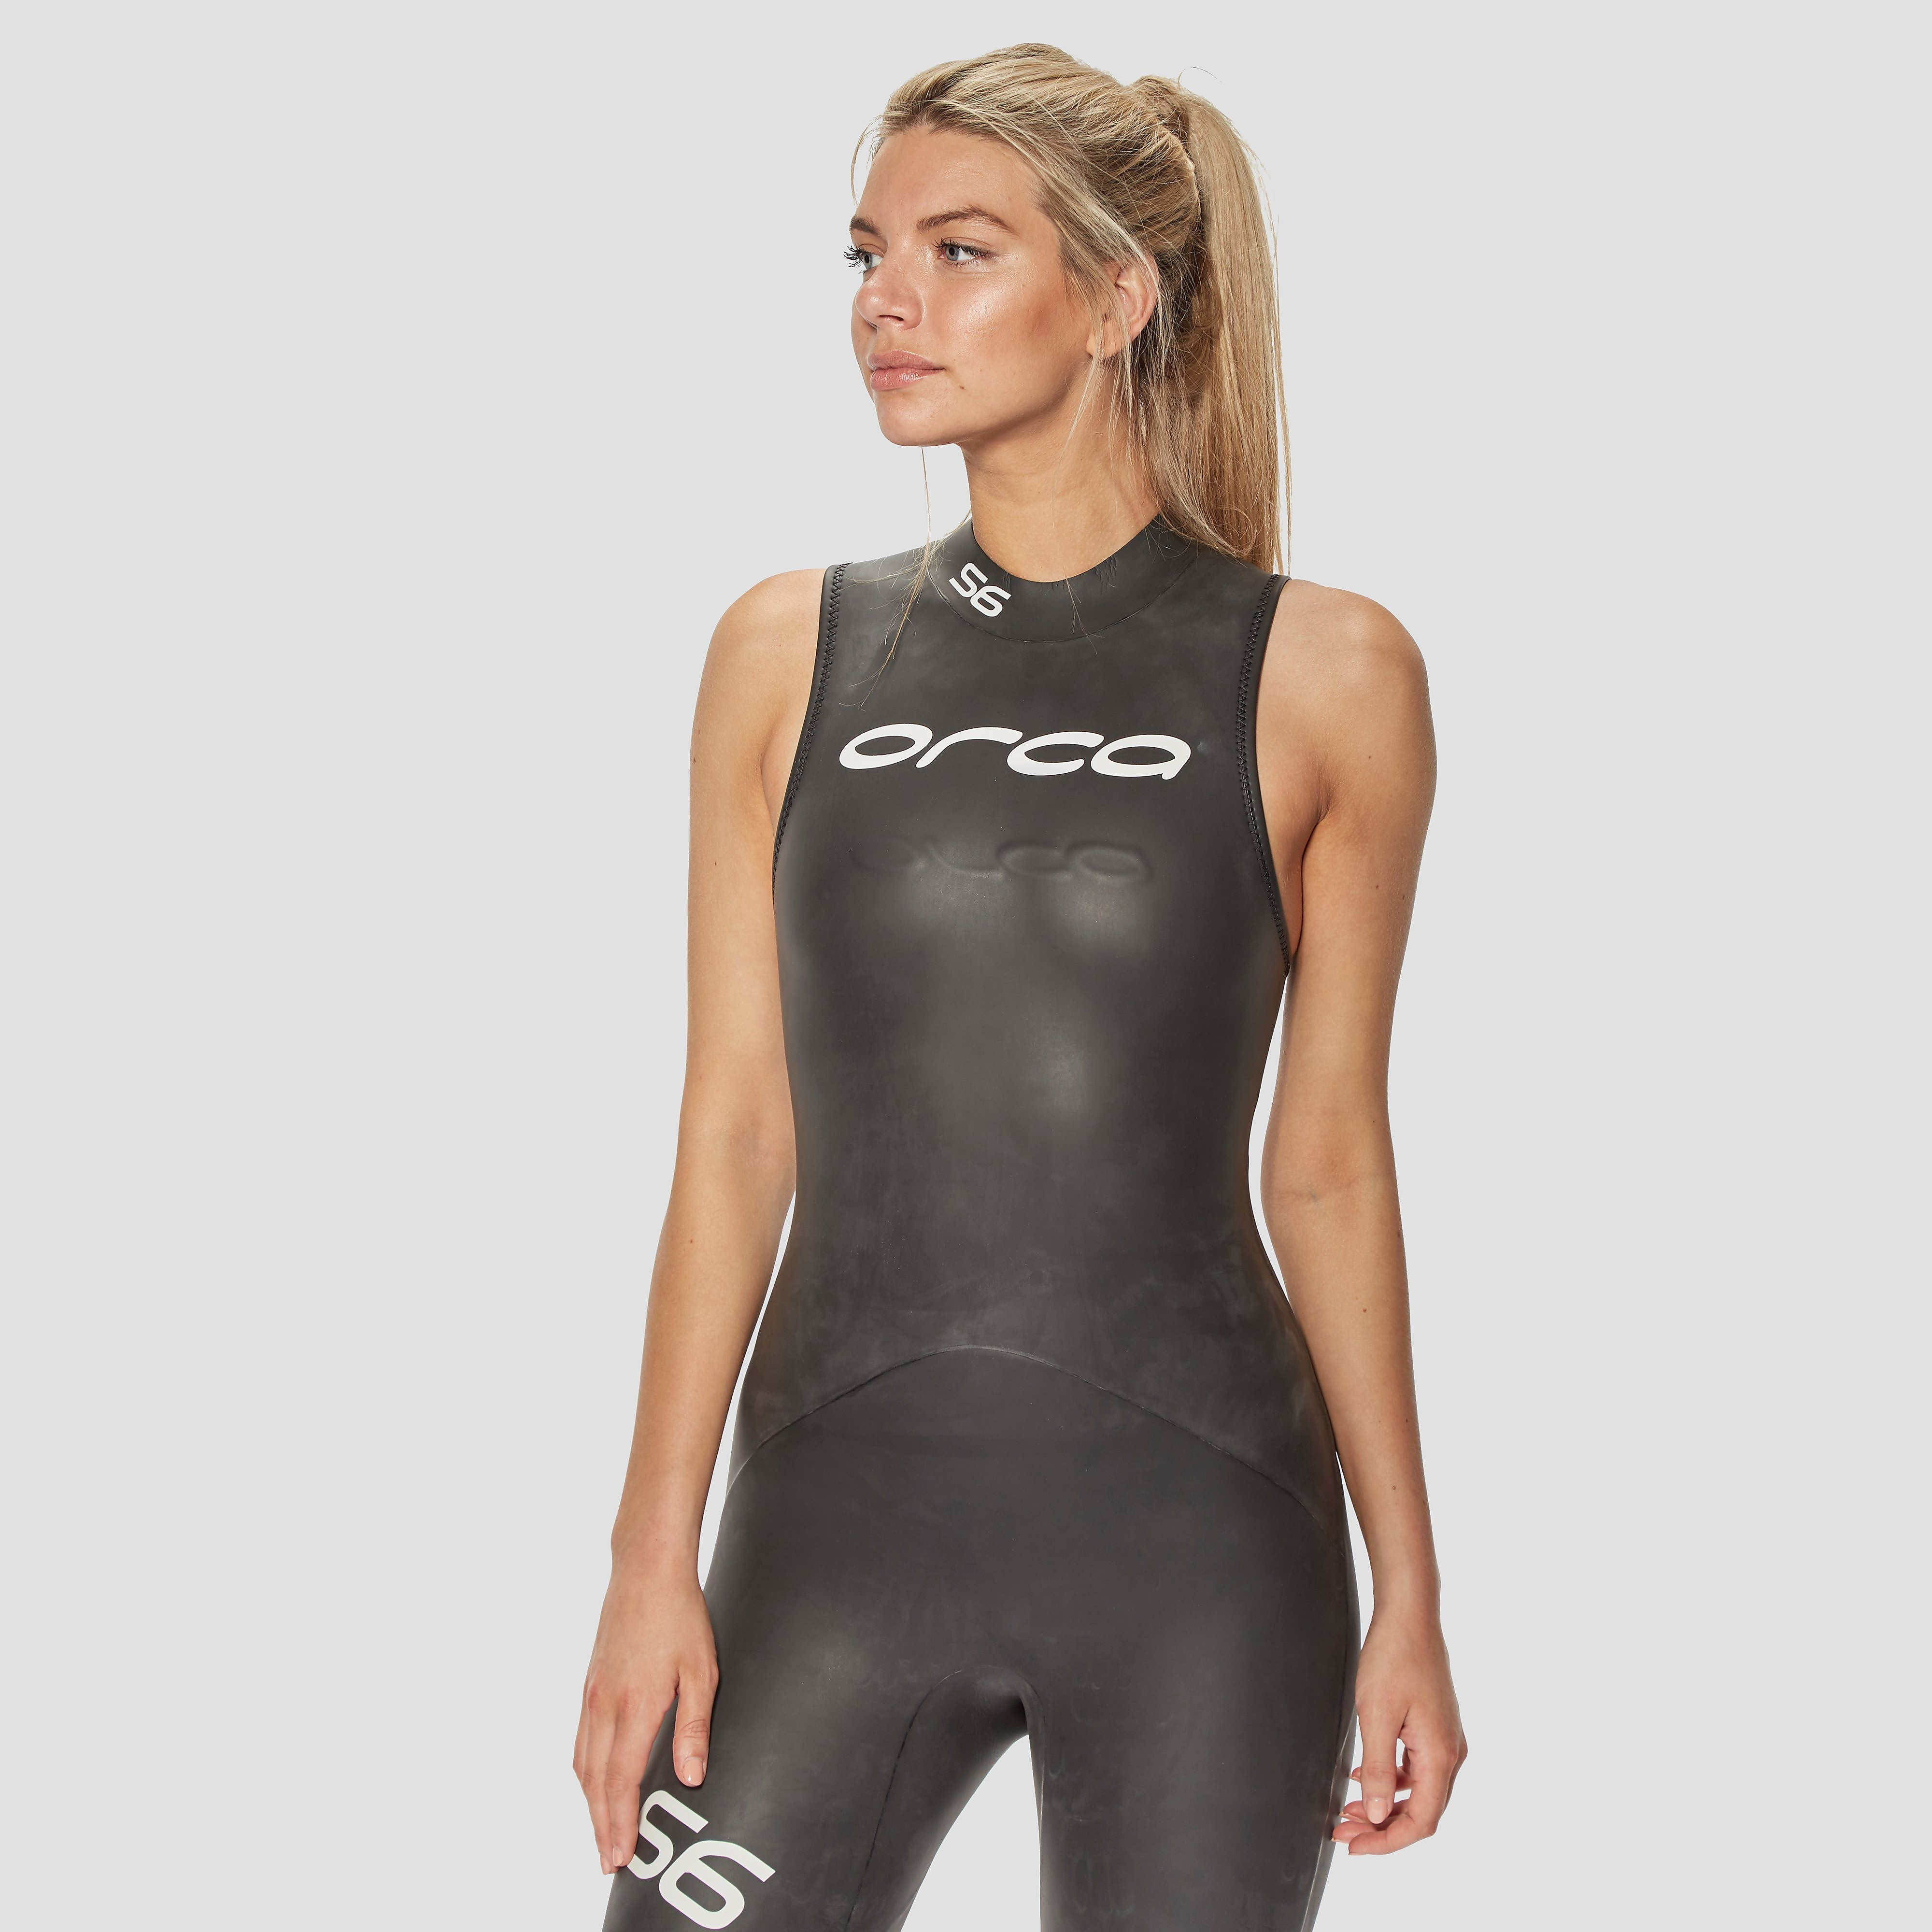 Orca S6 Sleeveless Women's Wetsuit